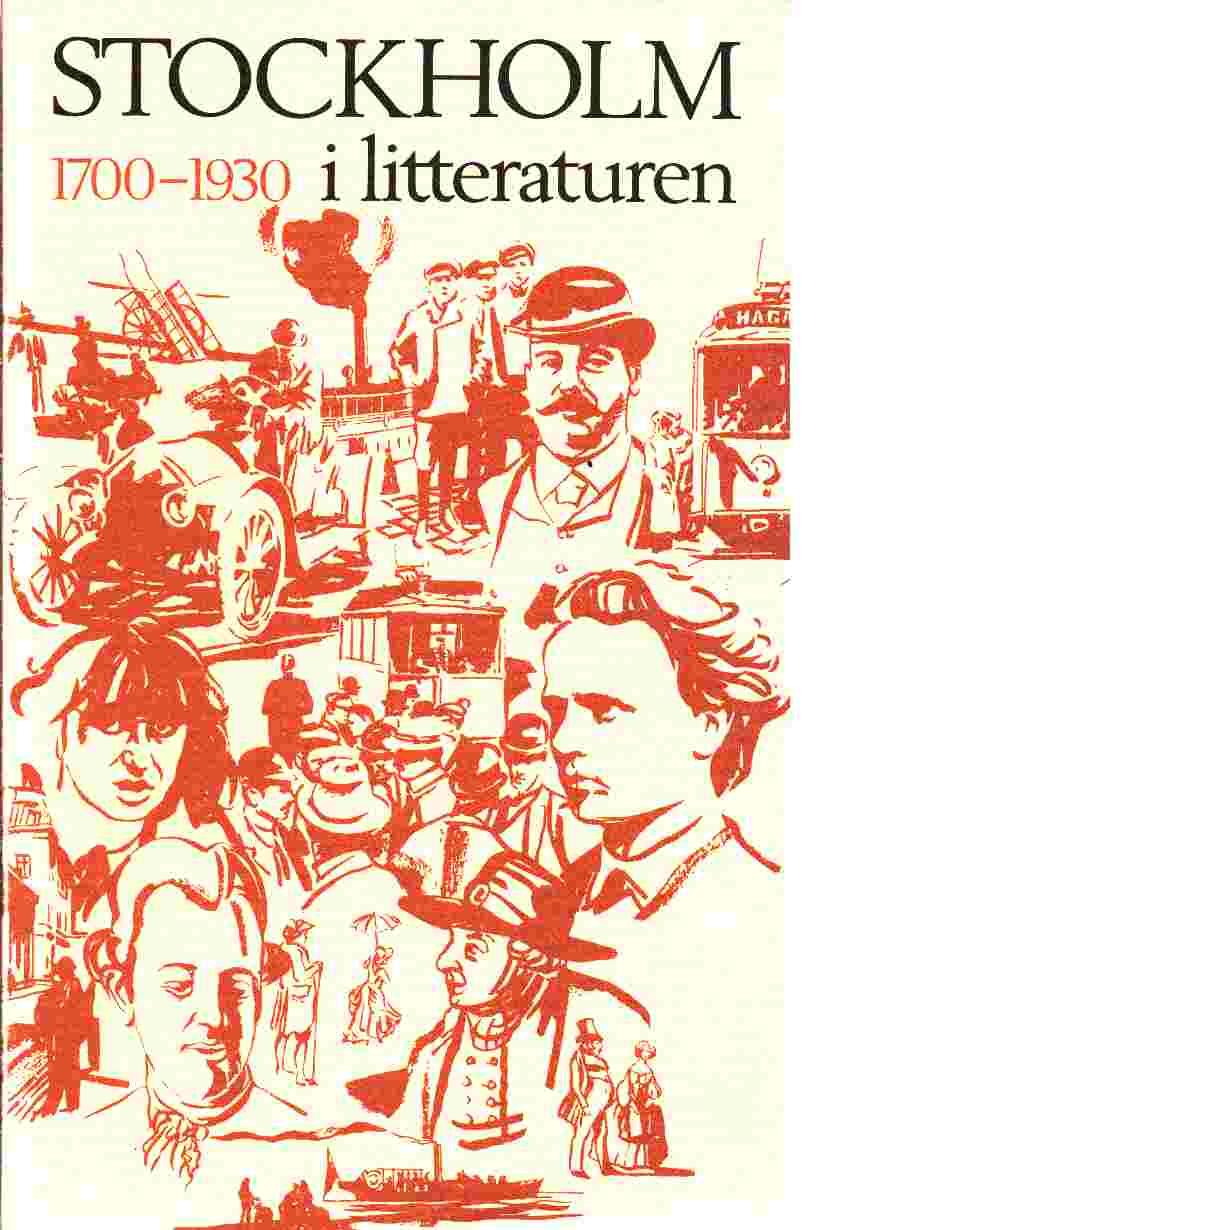 Stockholm i litteraturen 1700-1930 - Balgård, Kerstin, Nedgård, Ann-Christin  och  Bergqvist, Ulf,